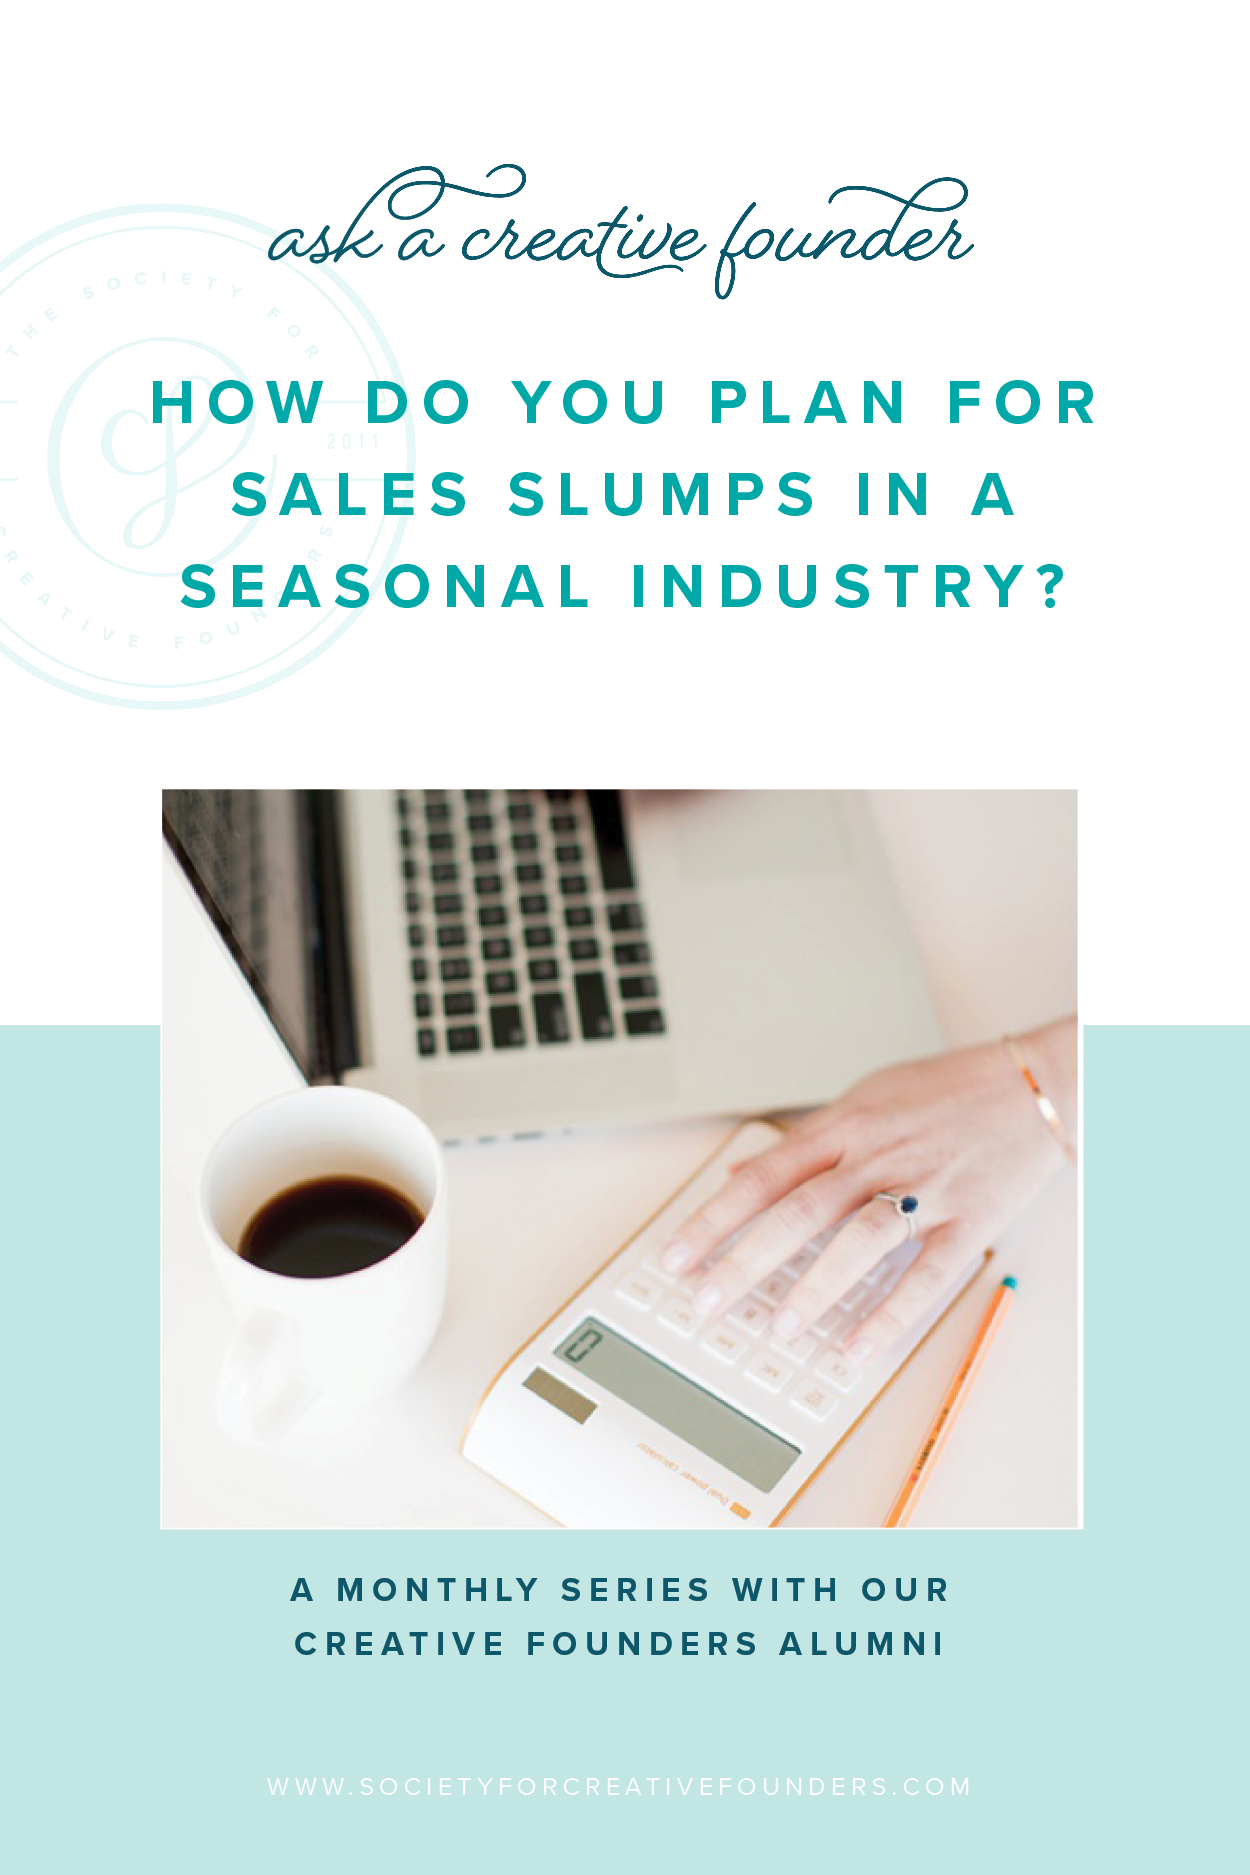 ask-a-creative-founder-planning-sales-slumps-seasonal-industry